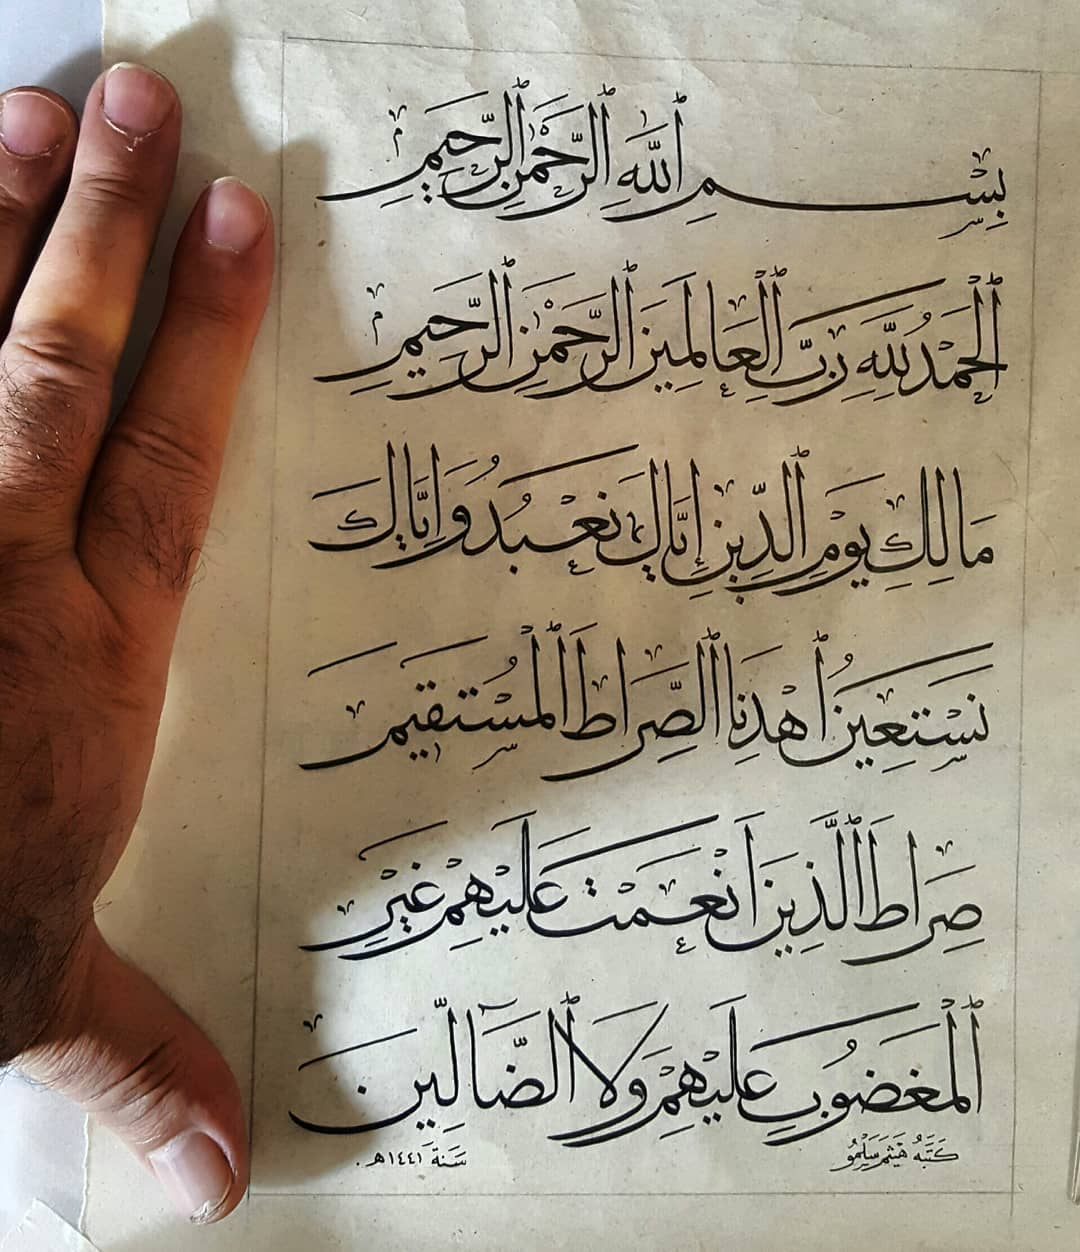 Works Calligraphy Haythamsalmo الفاتحة بقلم المحقق  1ملم ورق مزيج من الموز والجوت حبري التقليدي... 360 1